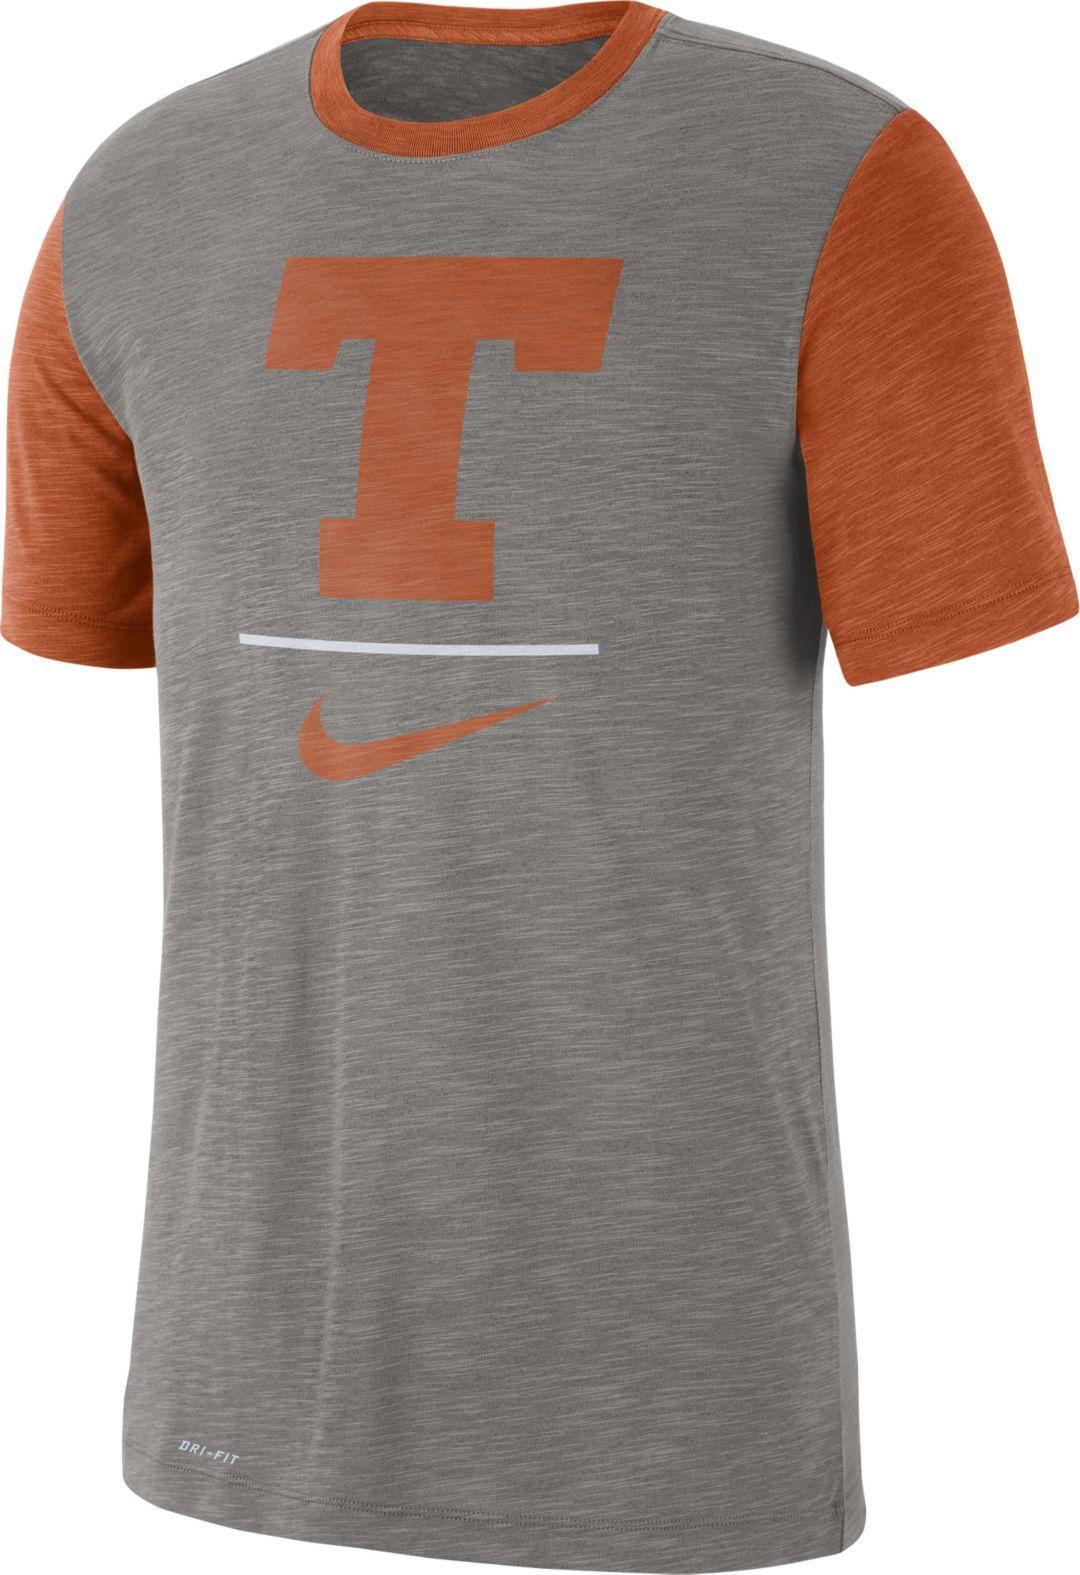 promo code 8fc17 ce36f Nike Men's Texas Longhorns Grey Dri-FIT Baseball Slub T-Shirt